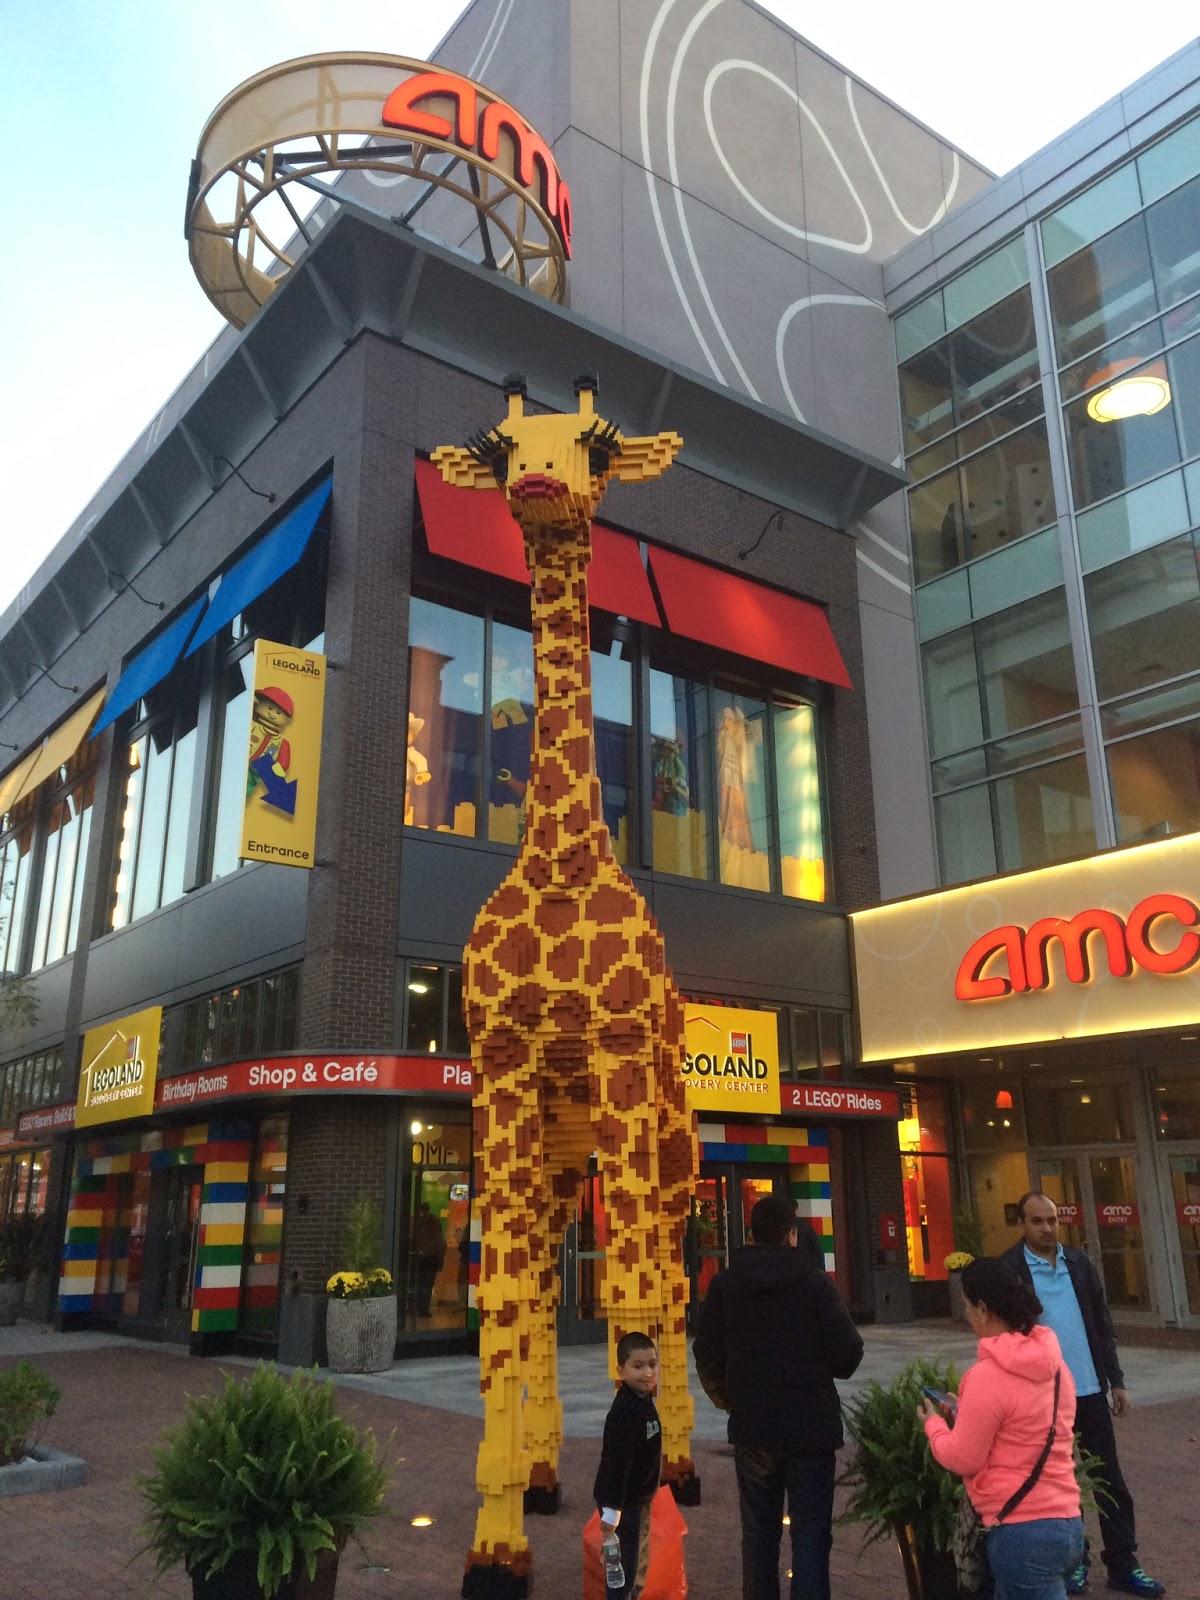 Giggles at Greene: LEGOLAND Discovery Center: Boston!